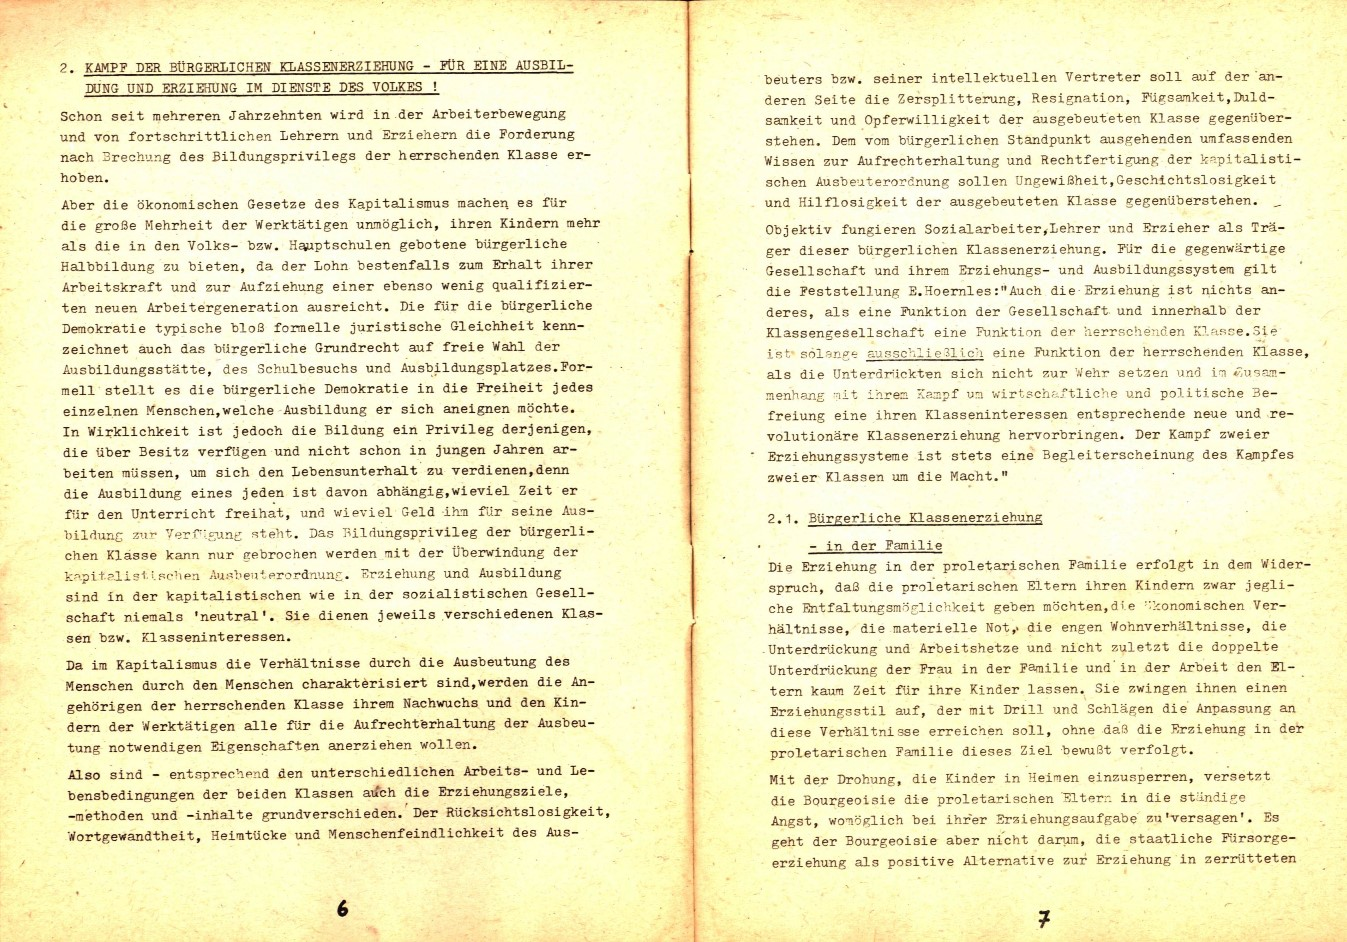 Berlin_BSLE_1975_Grundlagenpapier_05